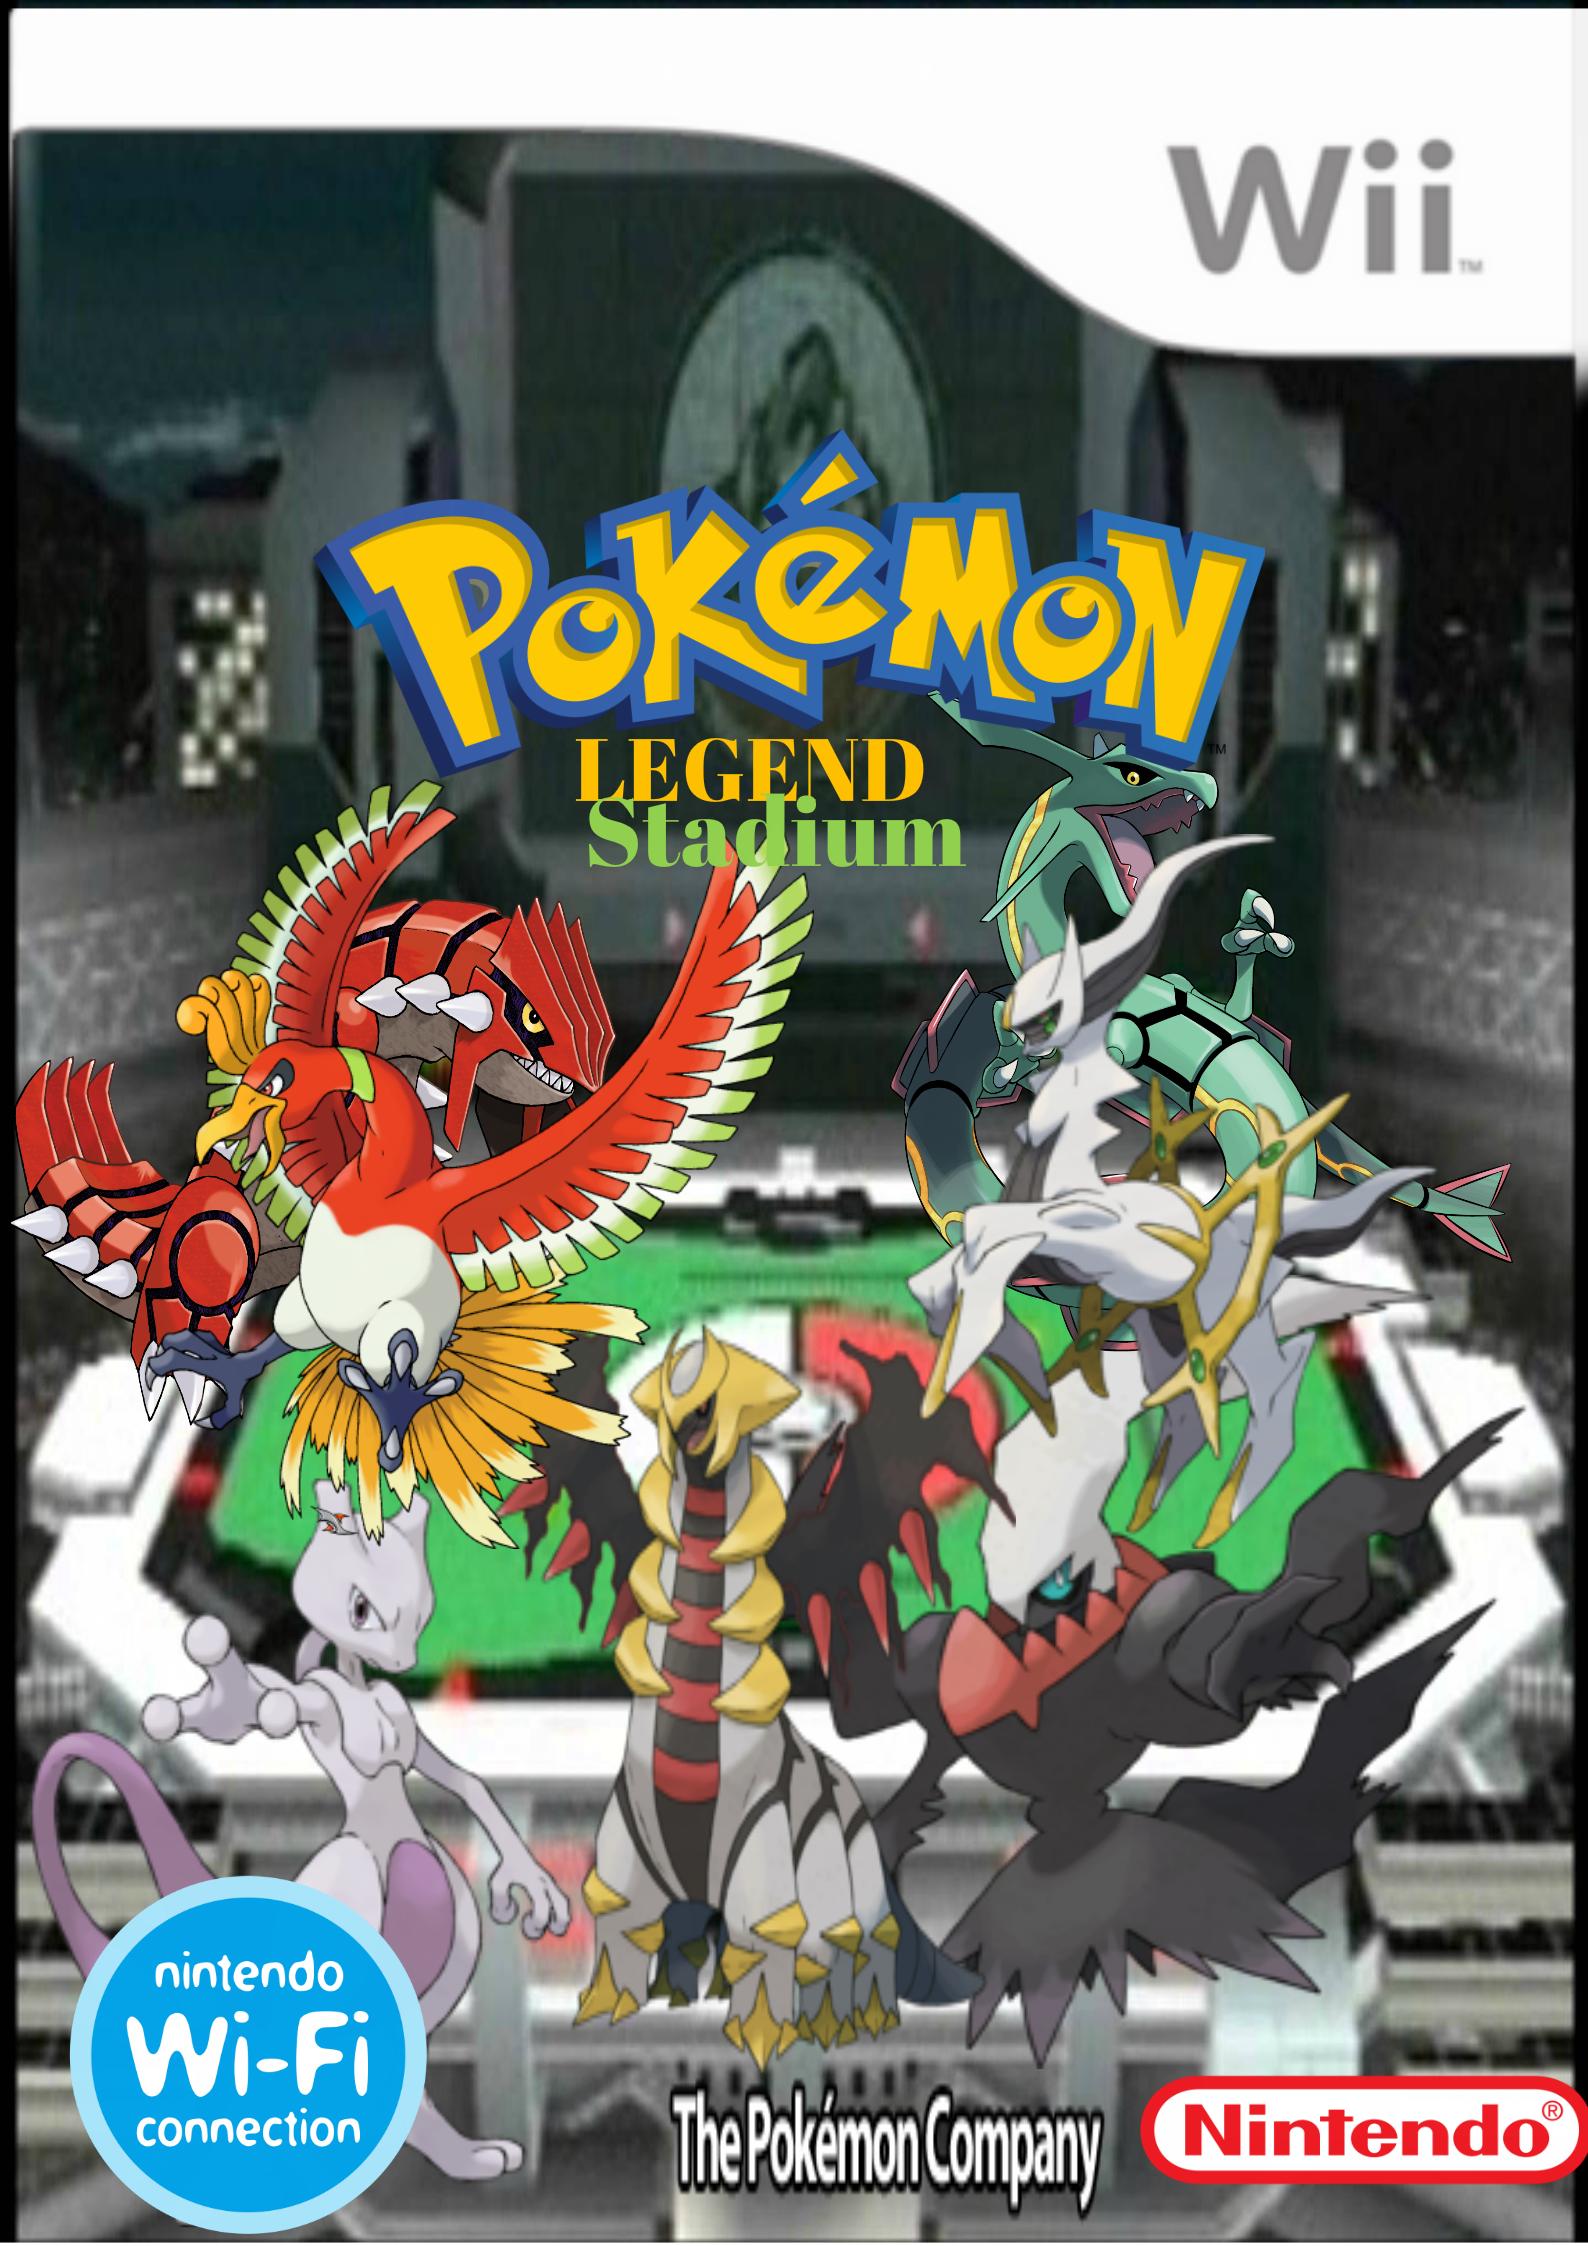 Pokémon Legend Stadium